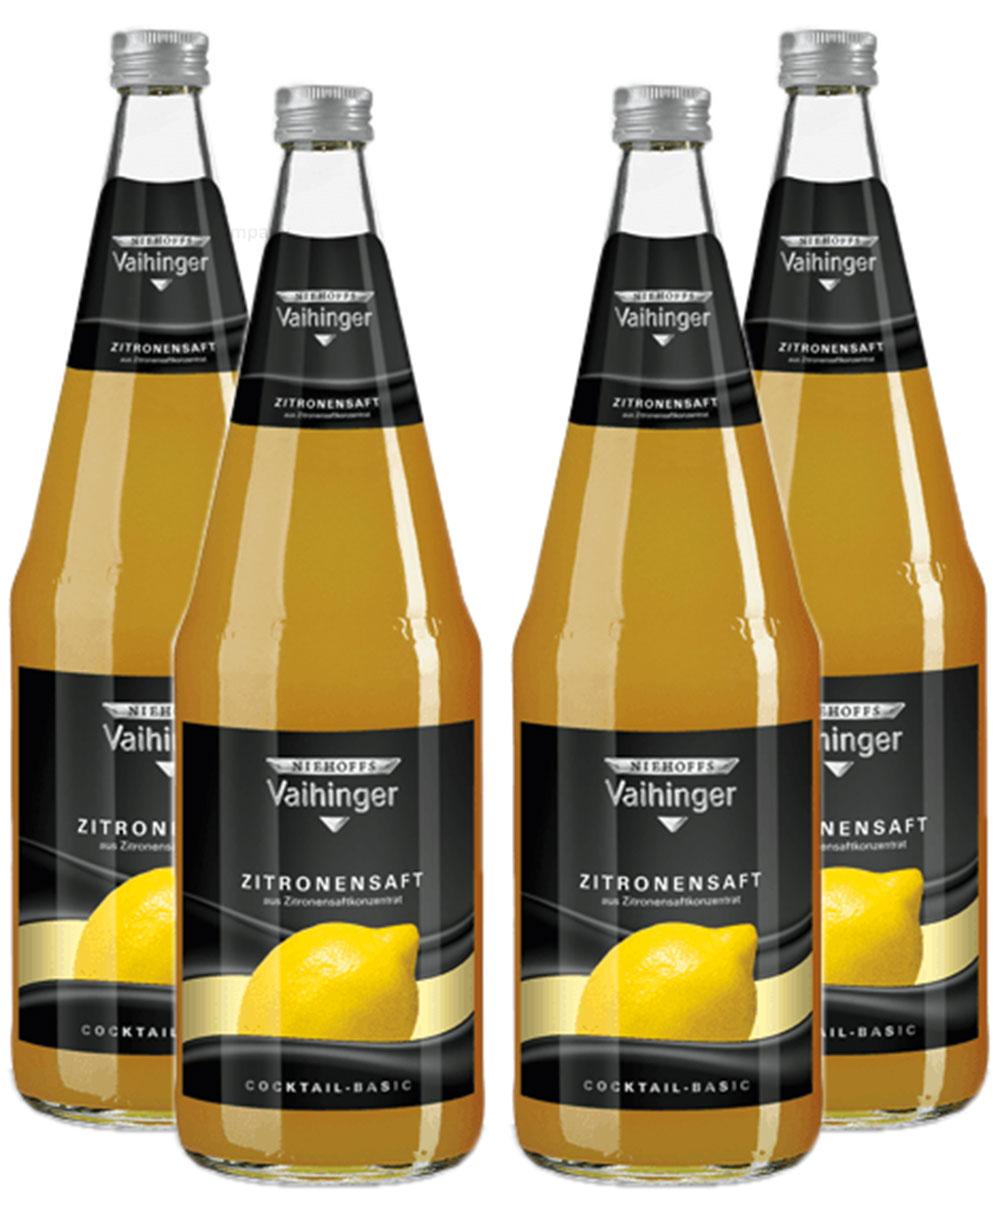 Niehoffs Vaihinger Zitronensaft 1L VDF - 4er Set inkl. Pfand MEHRWEG